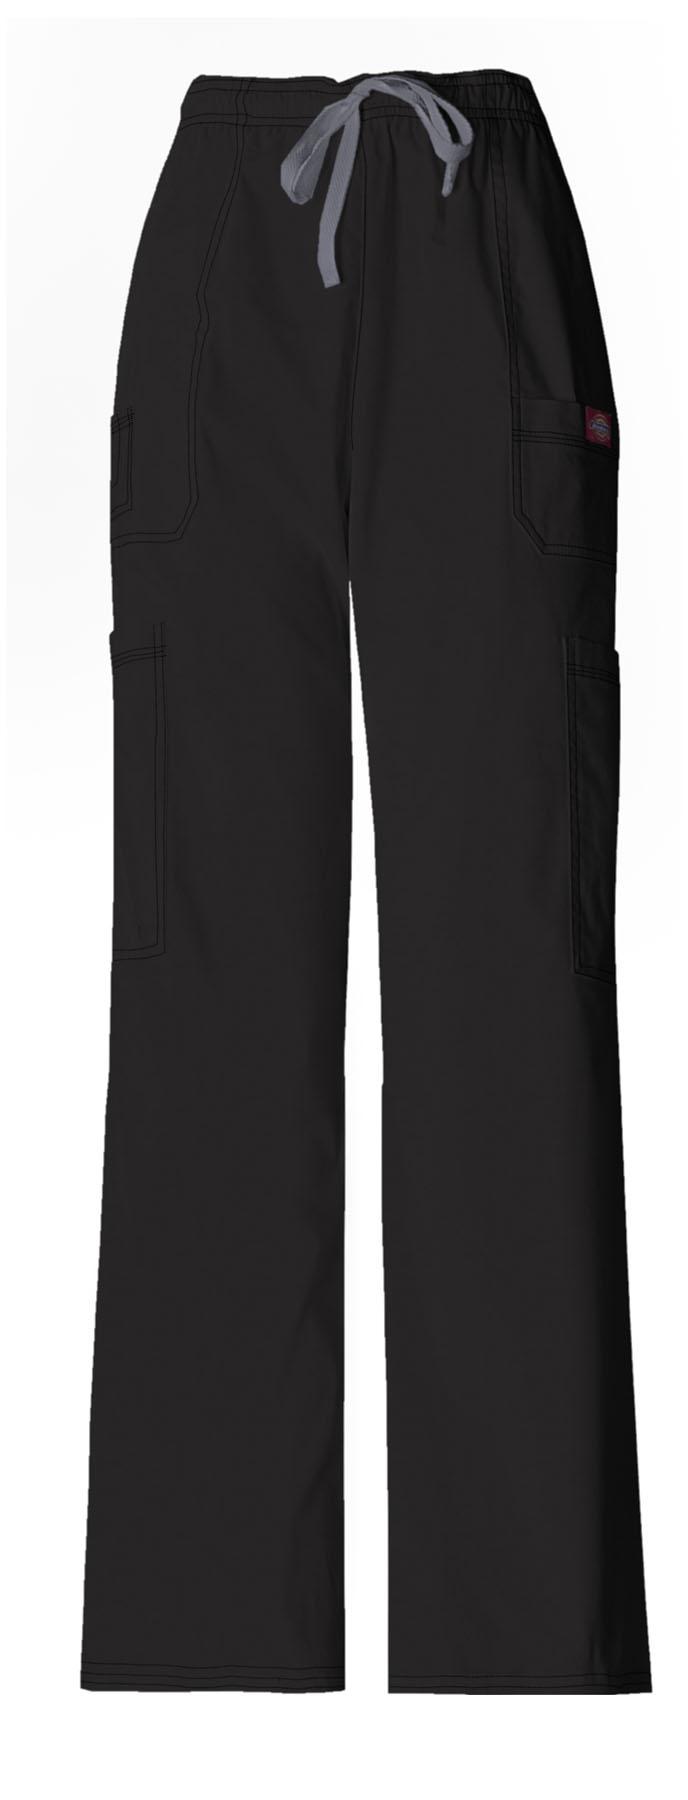 Dickies Men's Drawstring Cargo Pant -> Color: Black-> Size: XL -> 52%Cotton 45%Poly 3%Spandex